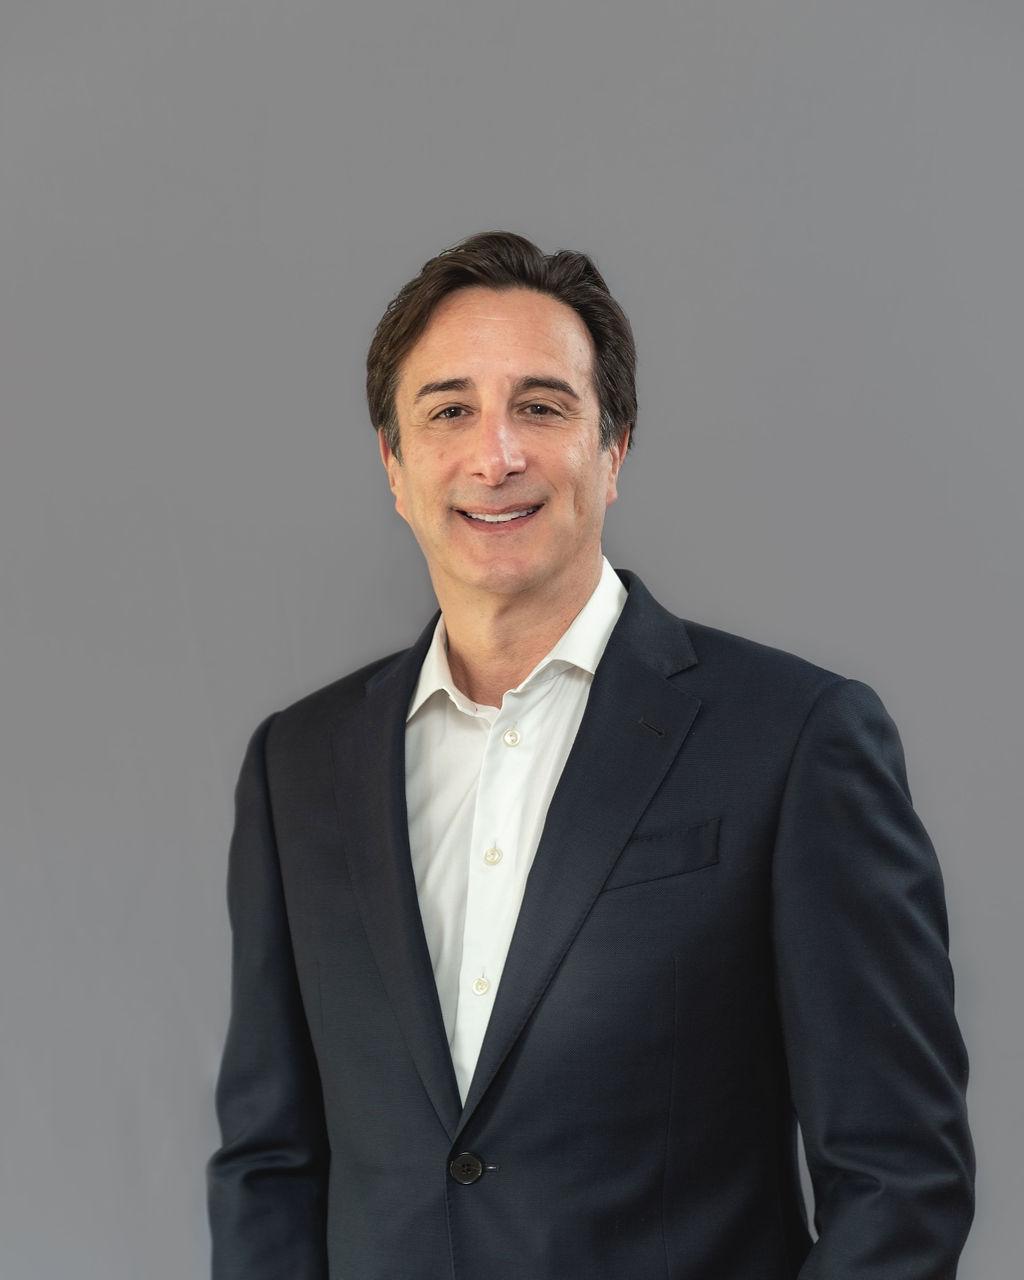 Dr. Leonard Gordon